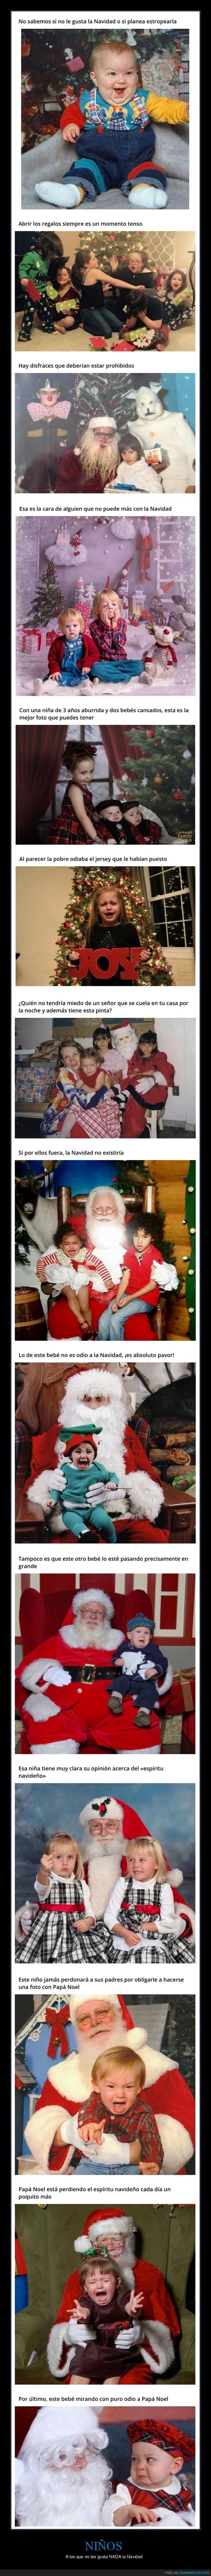 navidad,niños